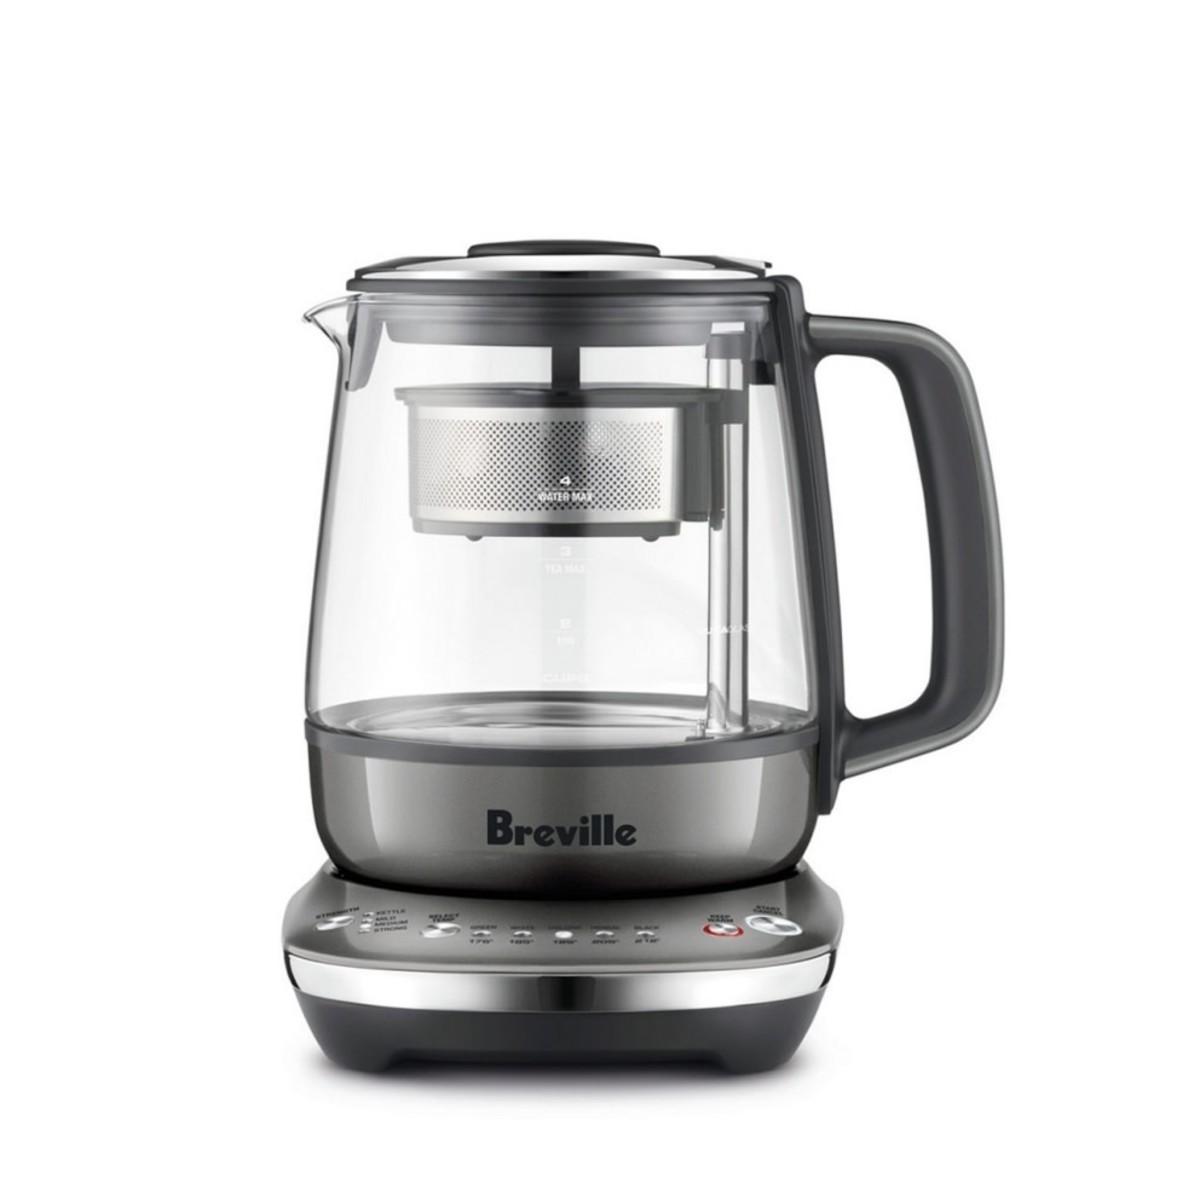 Breville Breville Tea Maker Compact